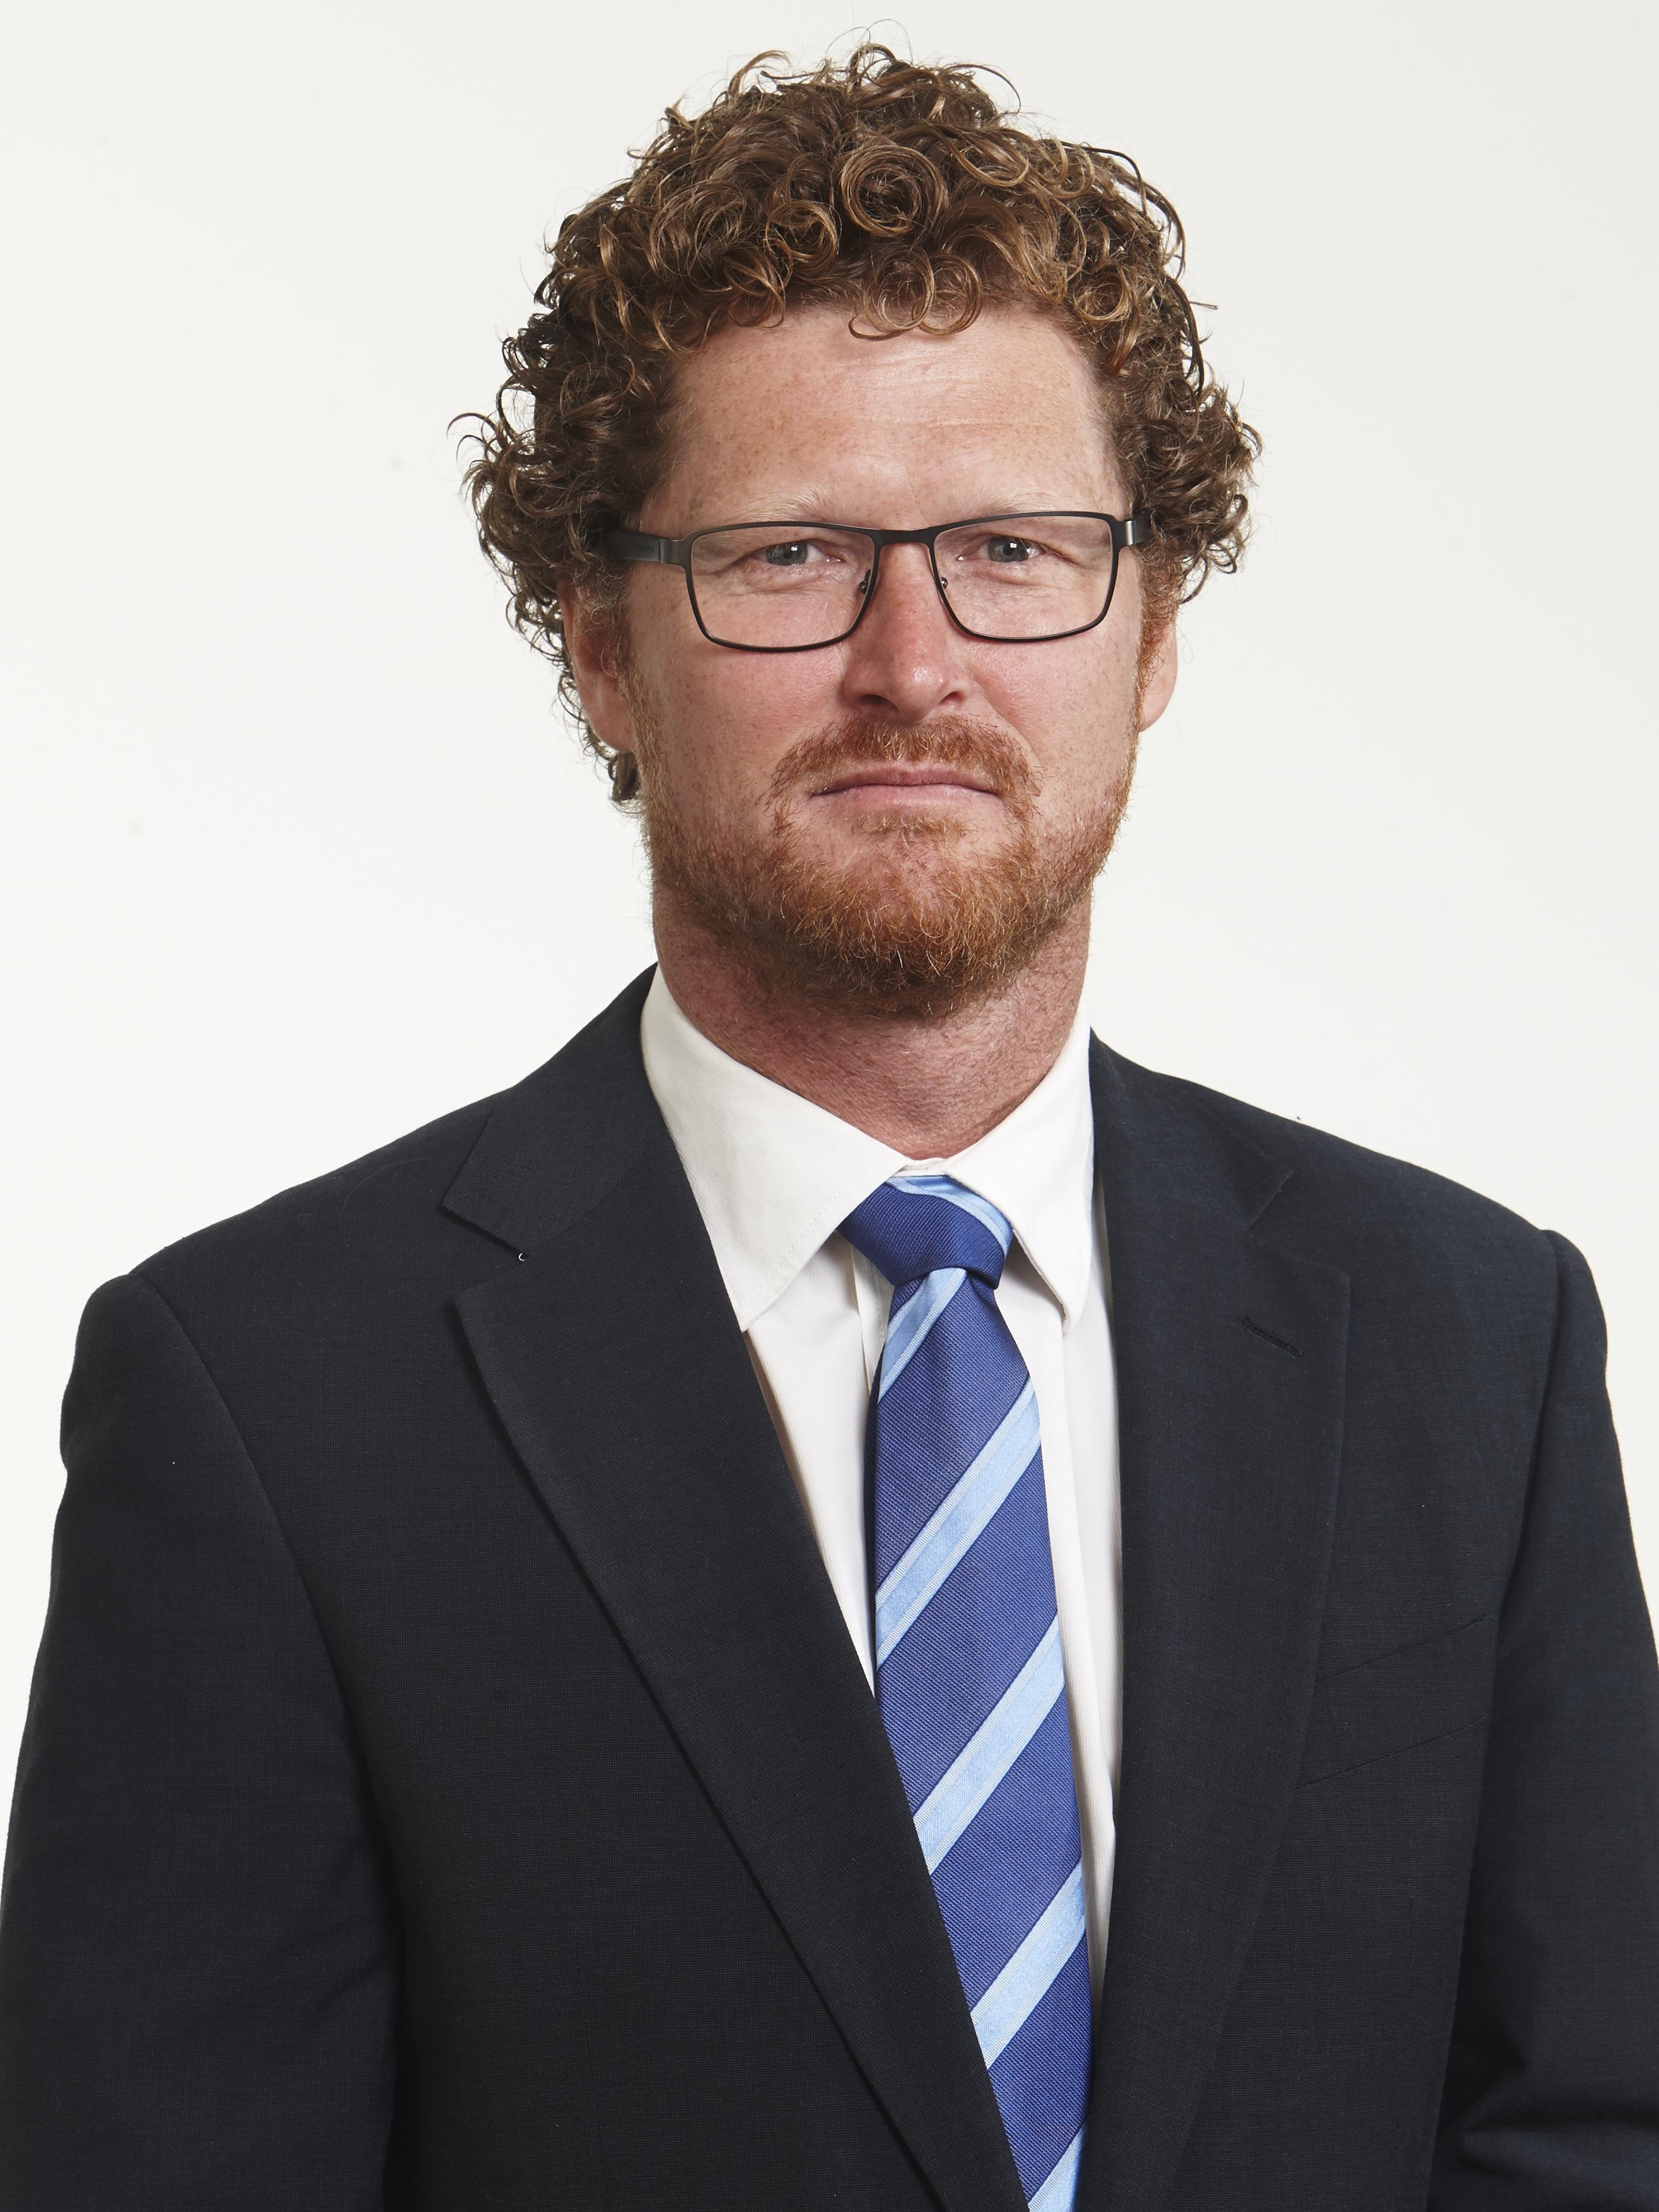 Andrew Dimsey, BA LL.B (Hons) (Monash)